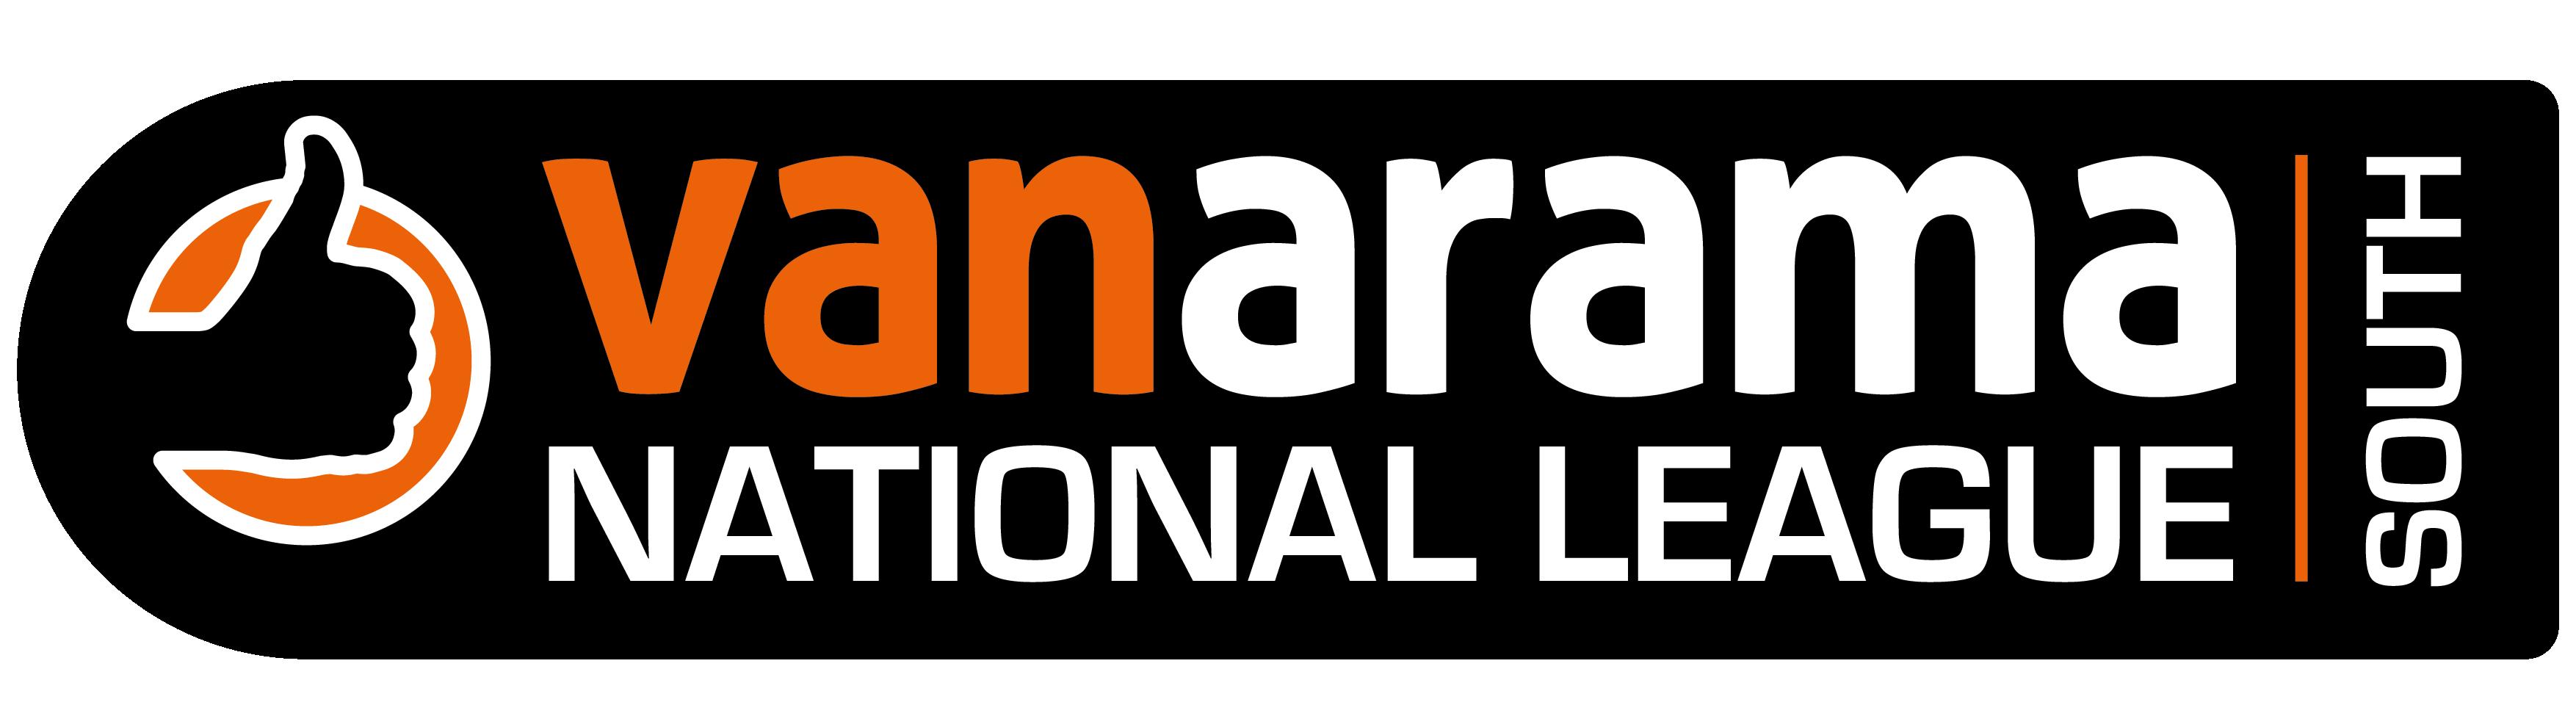 National League South